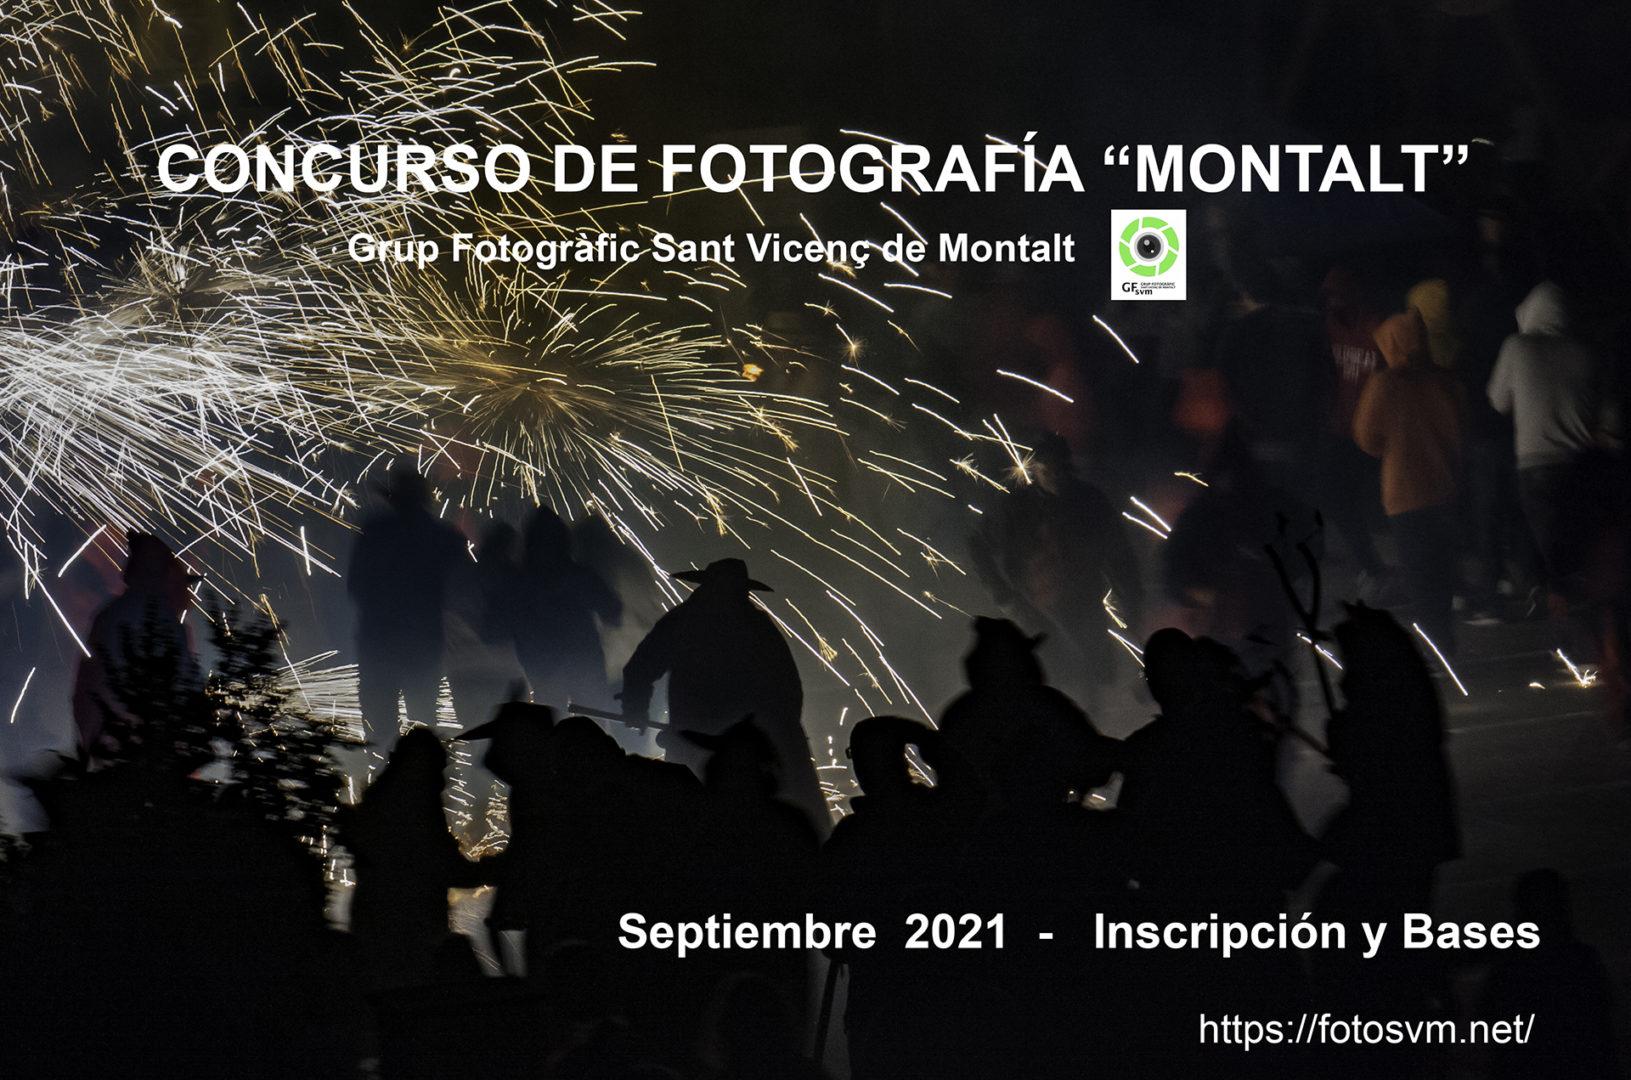 Cartell-Concurs-Montalt-2021-W-1631x1080.jpg